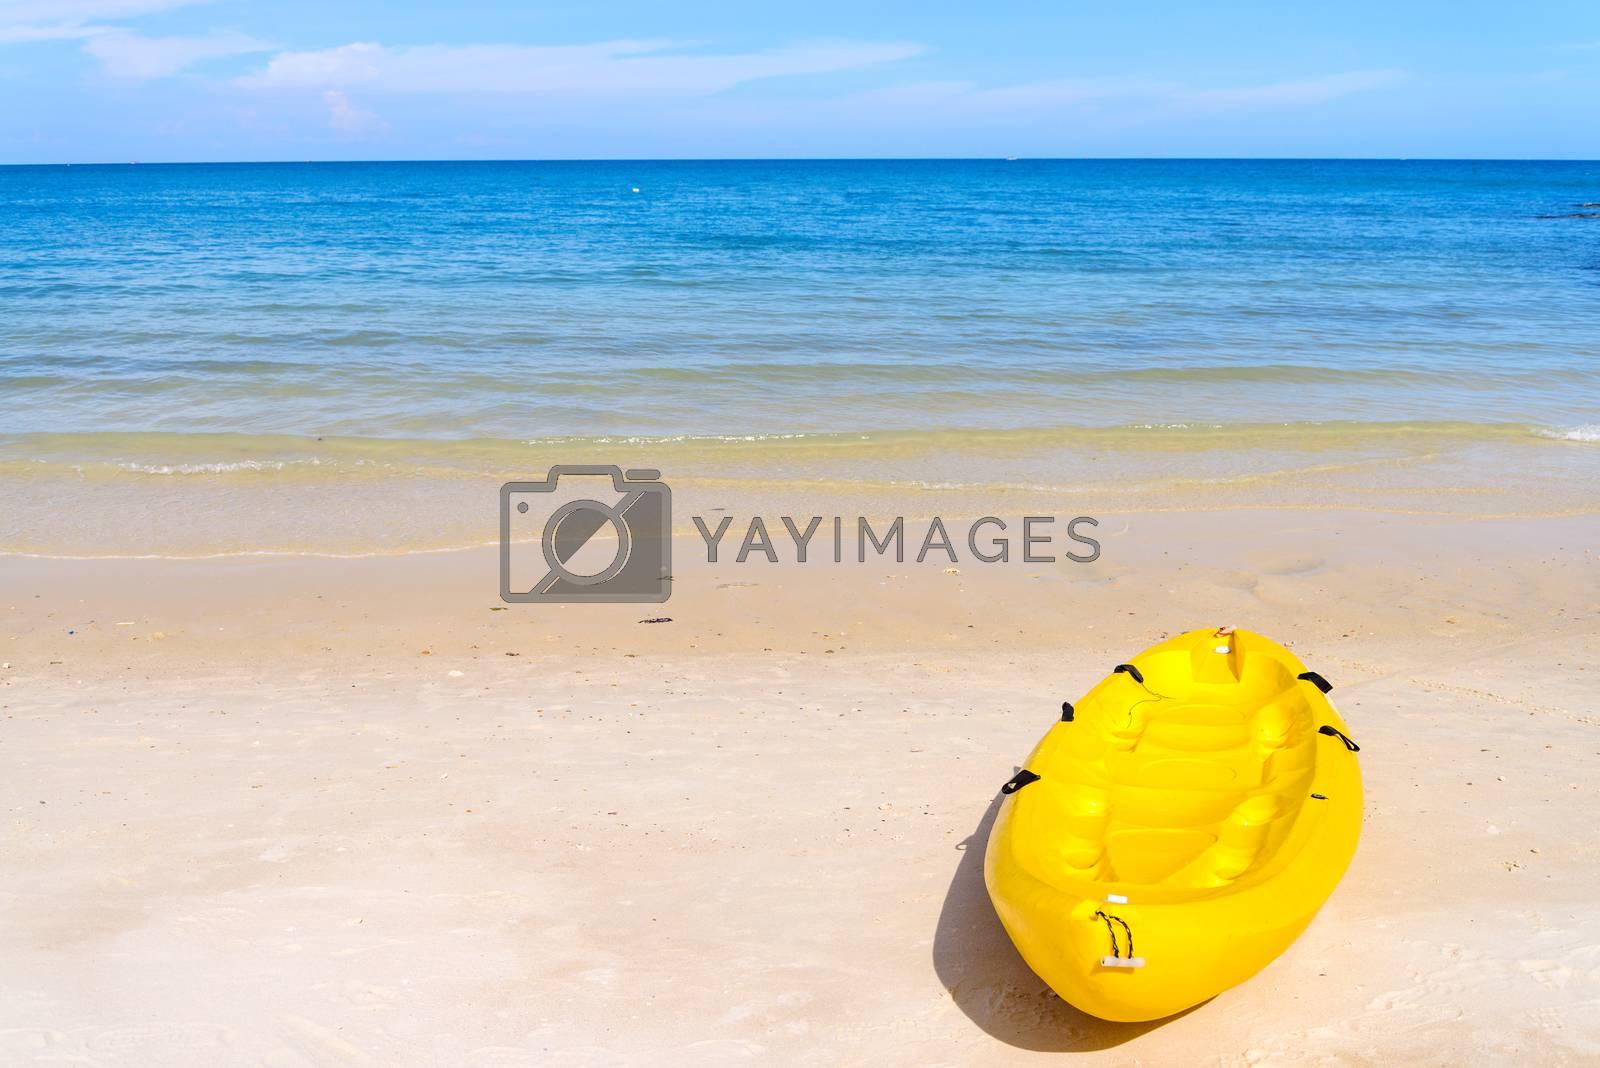 Royalty free image of Kayaks on the tropical beach, Mu Koh Samet - Khao Laem Ya Nation by jakgree